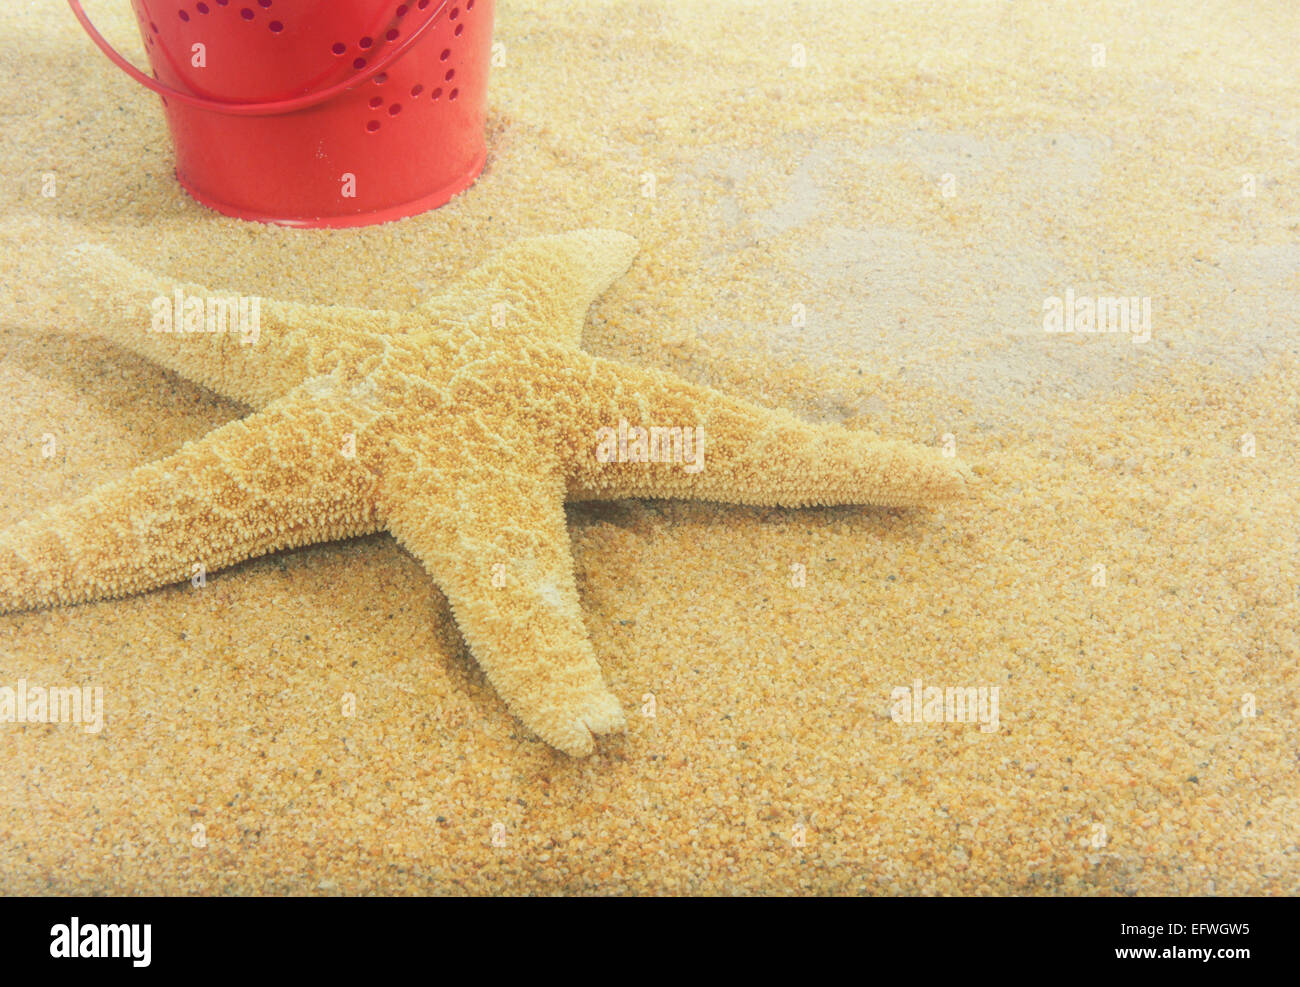 vintage-red-tin-bucket-star-shaped-cutouts-sandy-beach-starfish-summer-EFWGW5.jpg